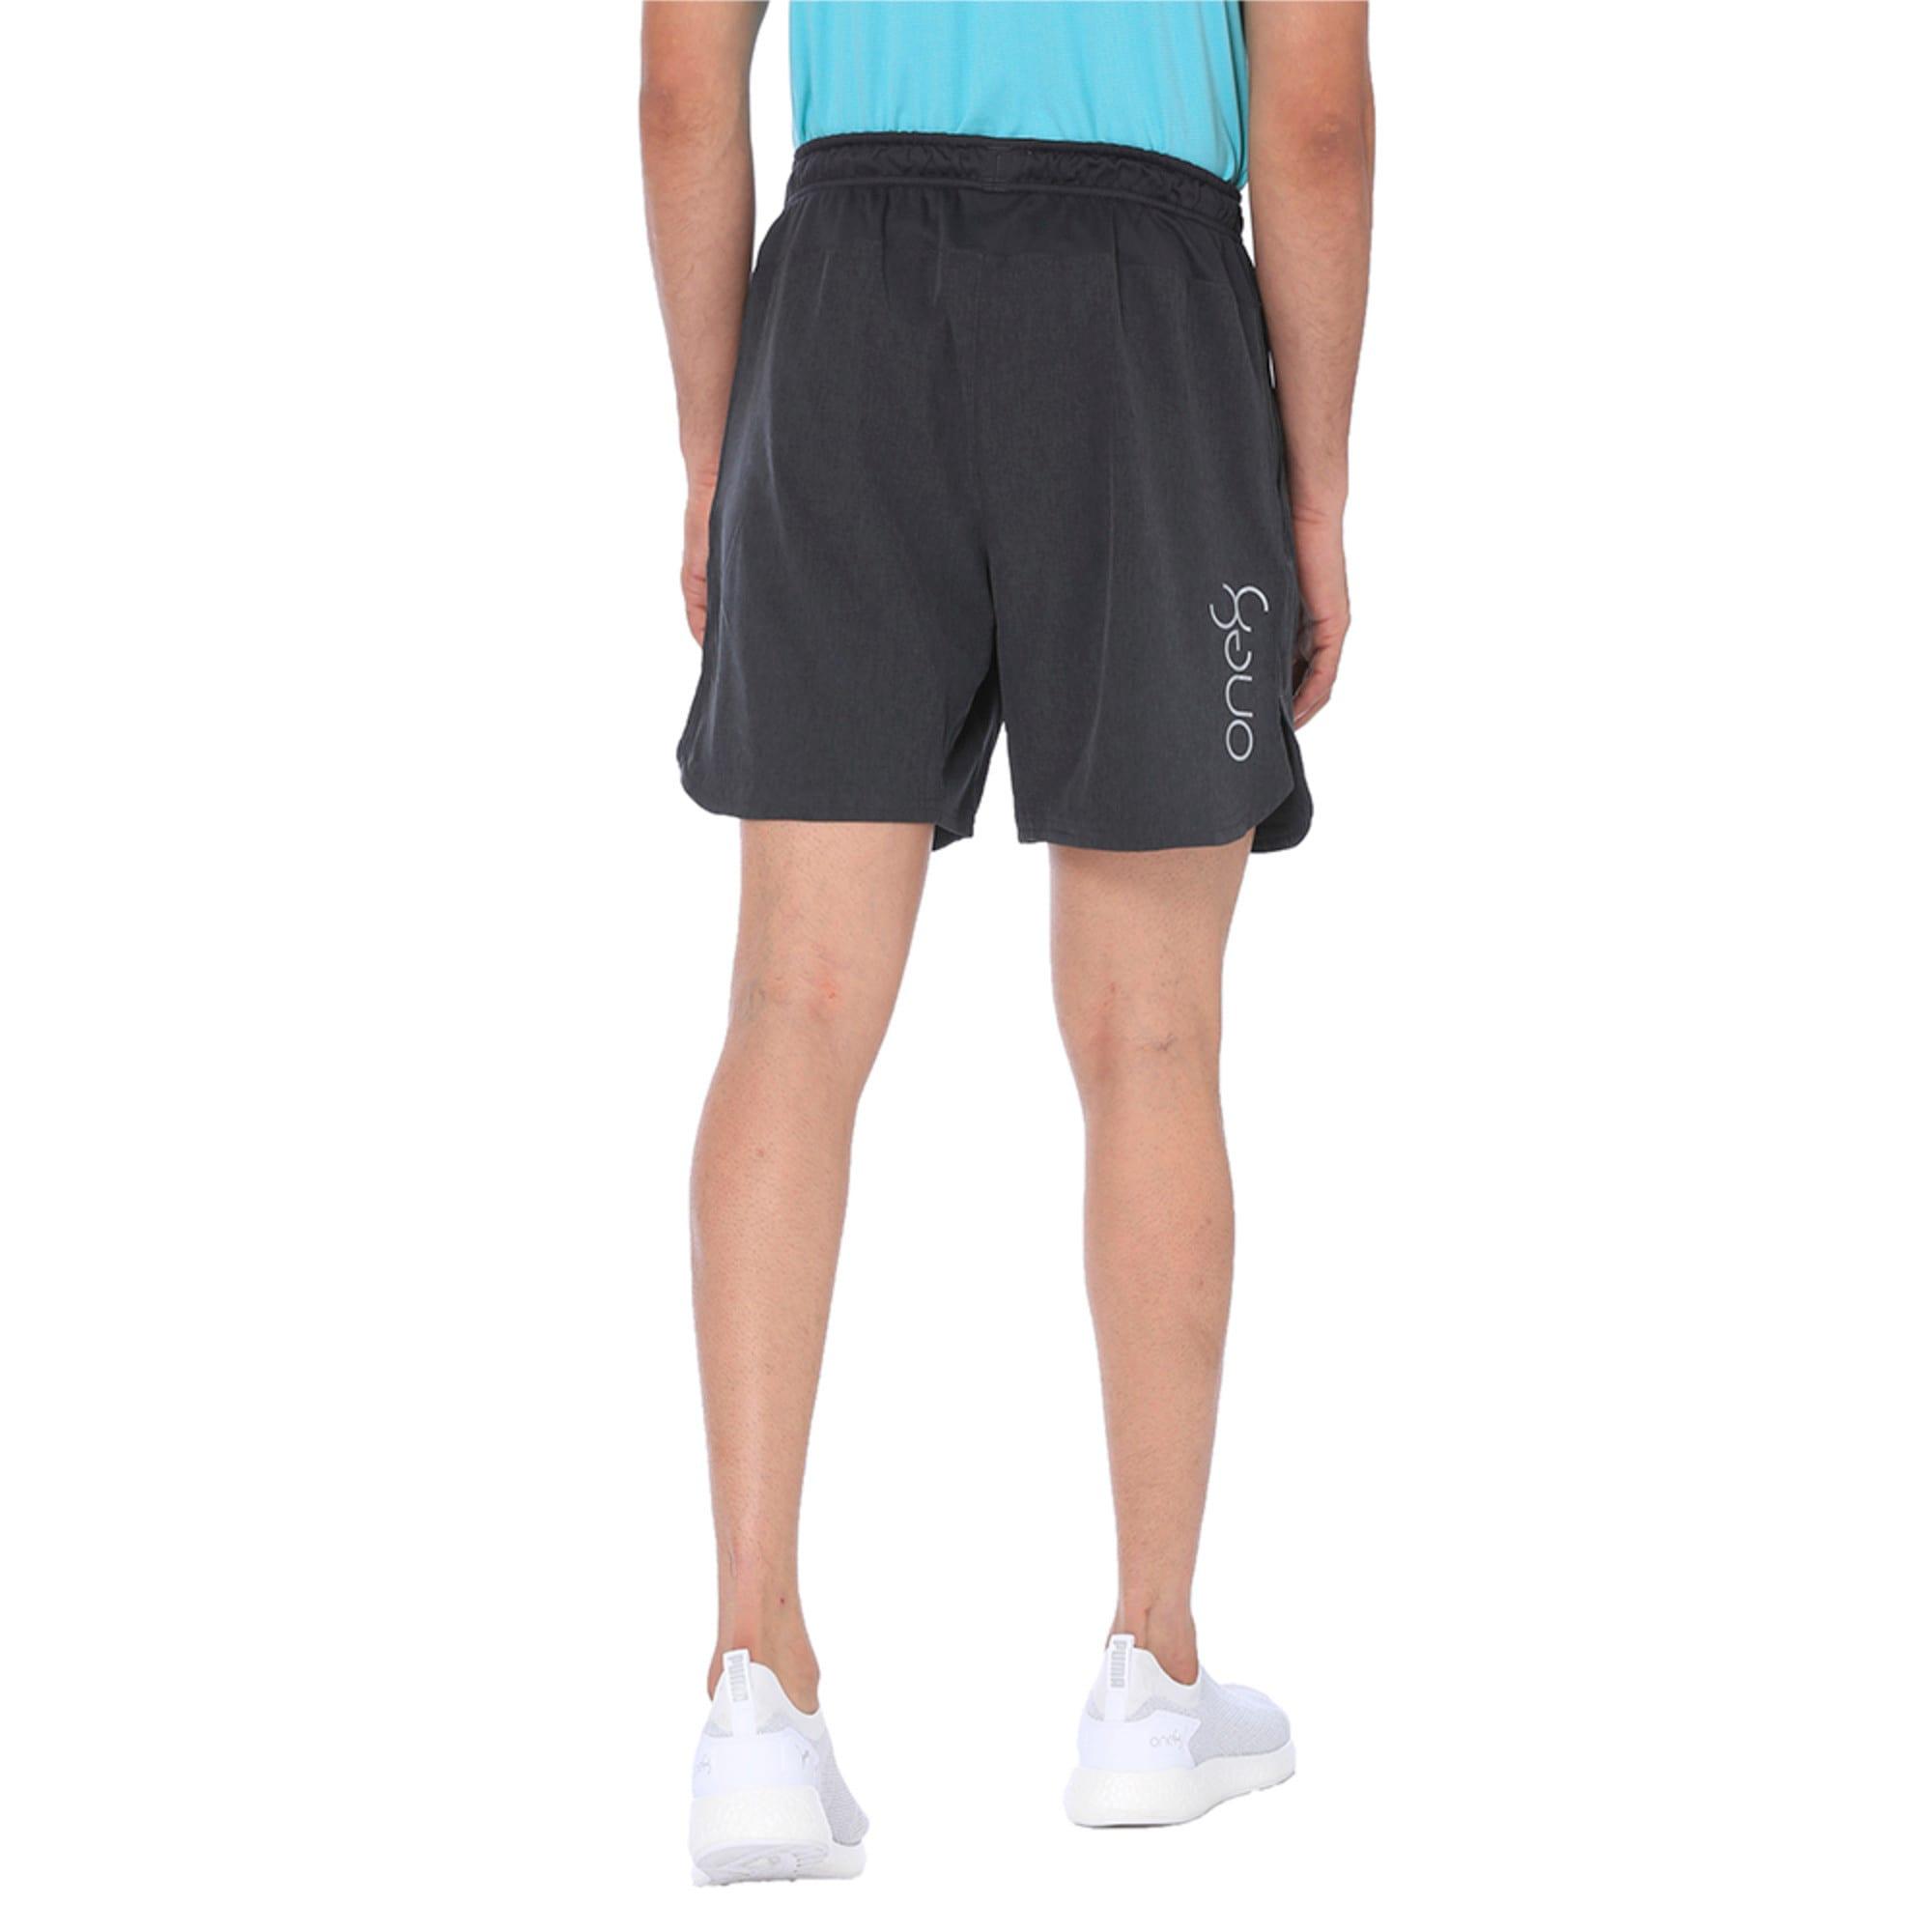 Thumbnail 5 of one8 VK Men's Active Shorts, Dark Gray Heather, medium-IND